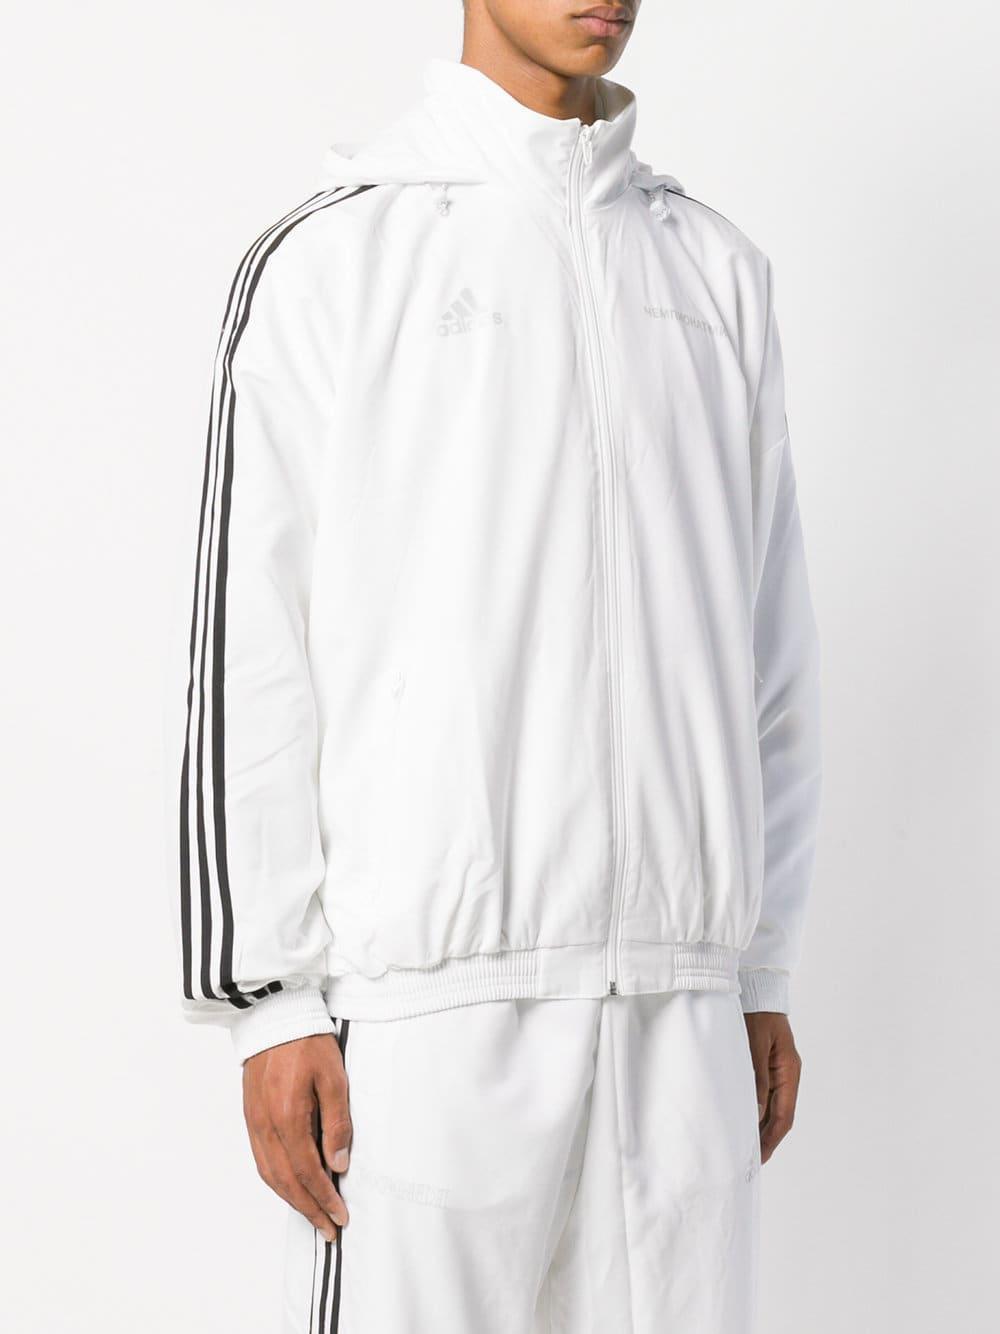 Homme Rubchinskiy X Sport De Pour Lyst Adidas Veste En Gosha 8wvCqxwUfg